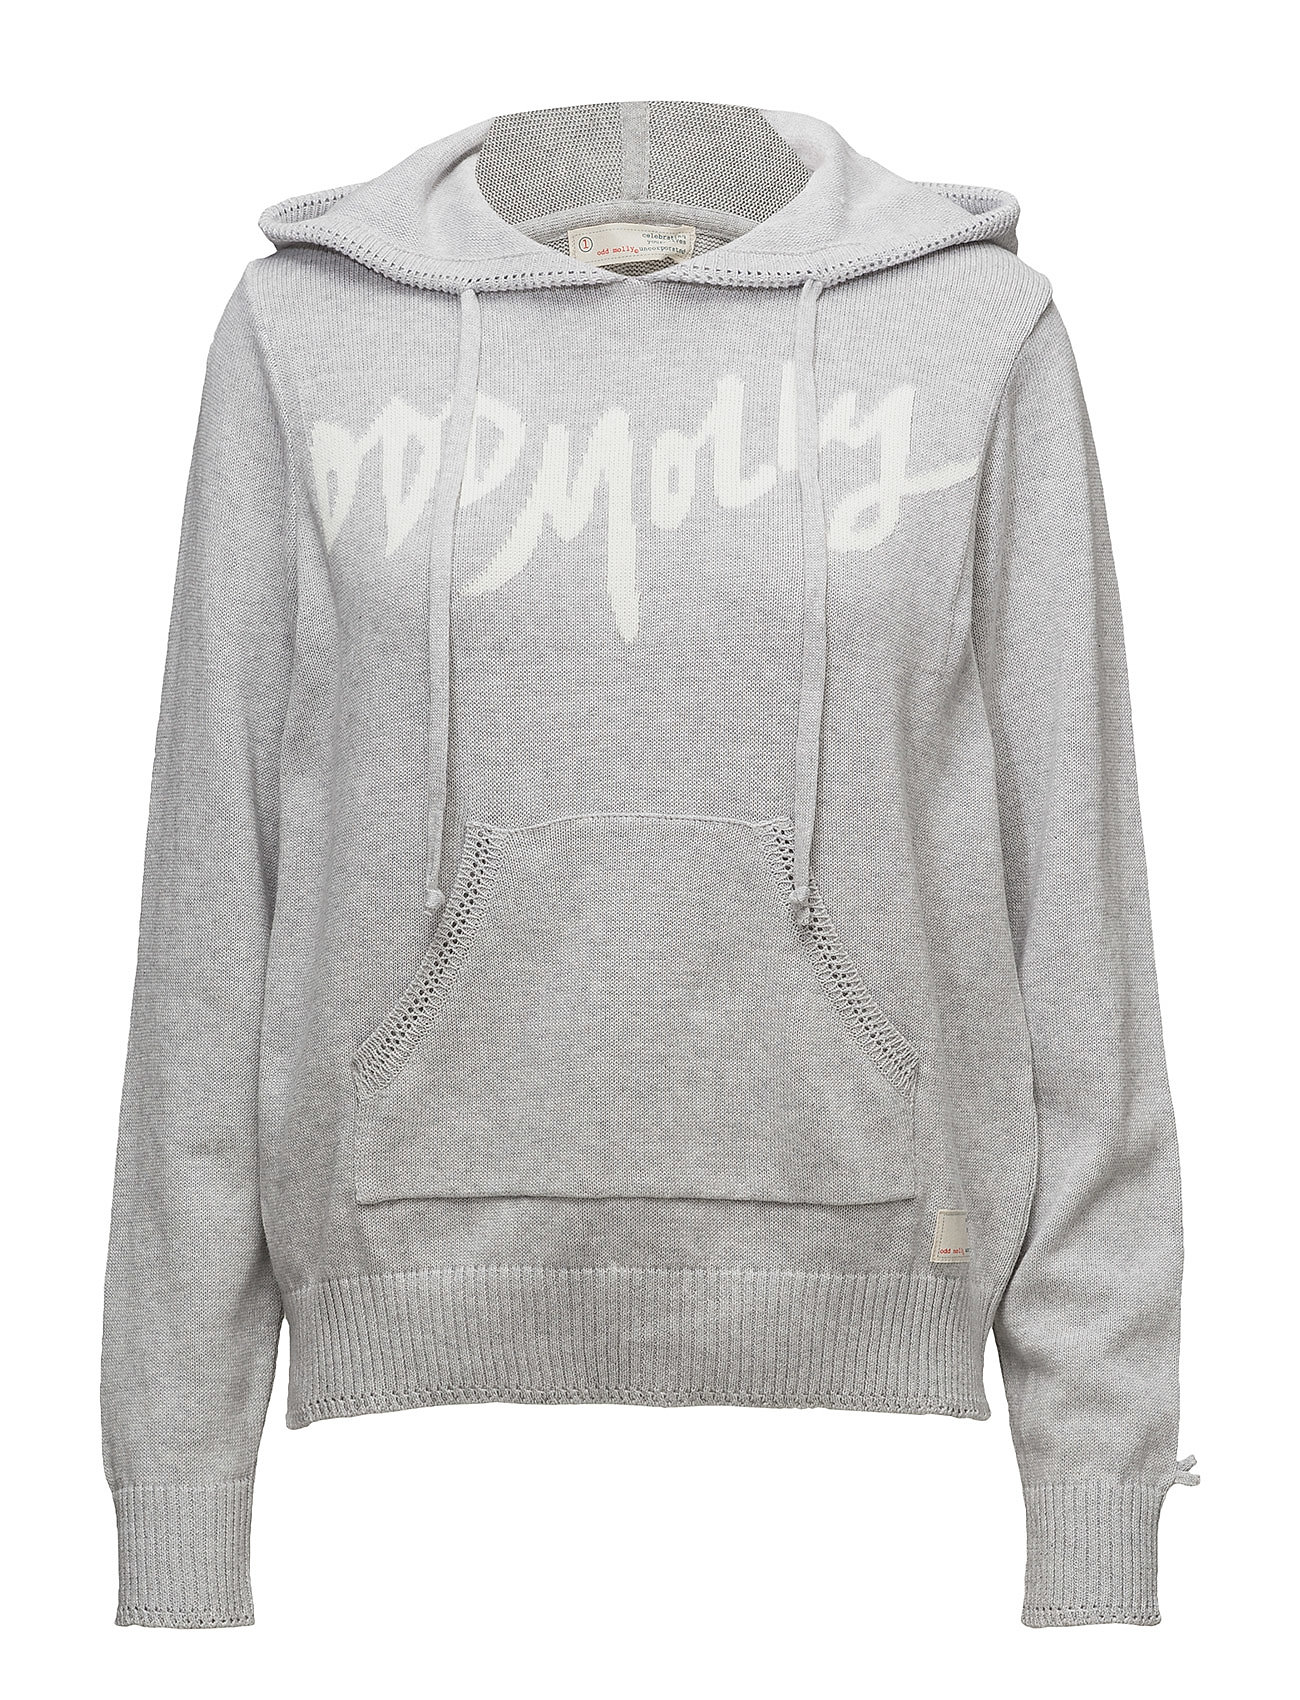 29028ea7a8f8 Hey Baby Hood Sweater (Grey Melange) (79.50 €) - ODD MOLLY -